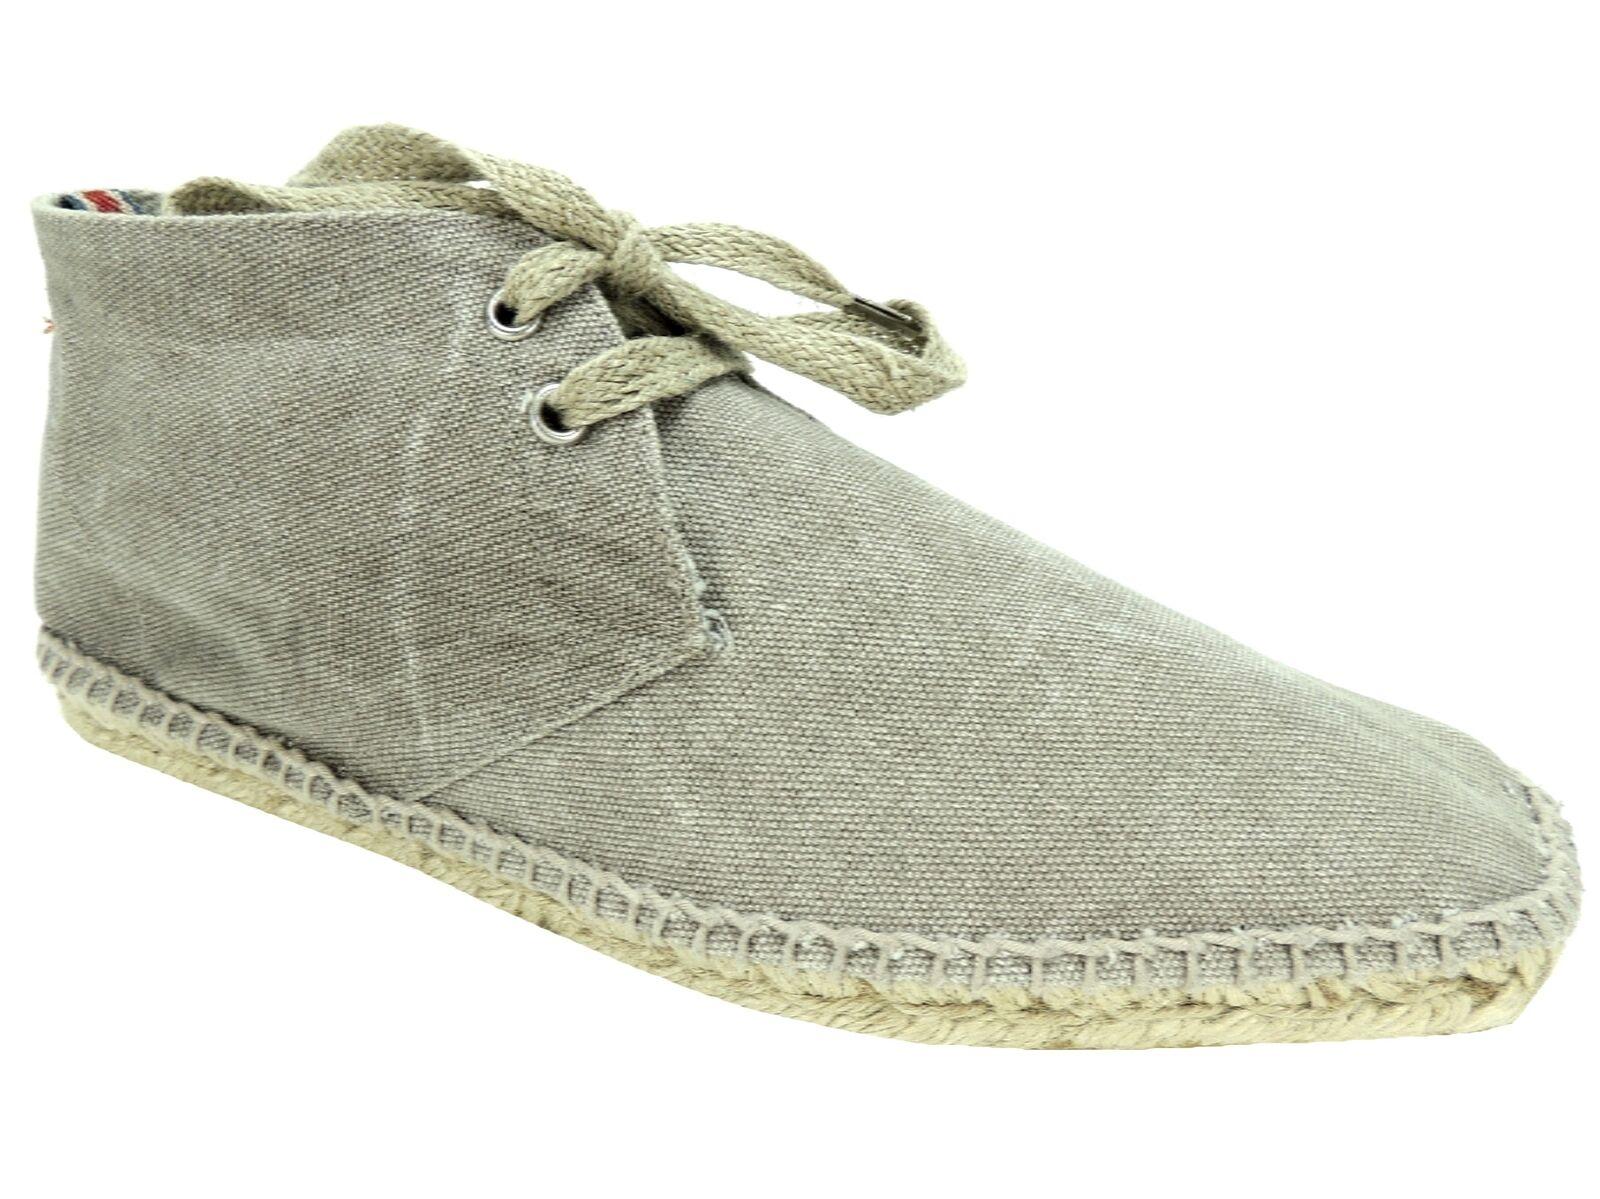 botas Desierto Castaner Para Hombre Alpargata Arena gris Lona euro nosotros tamaño 7;